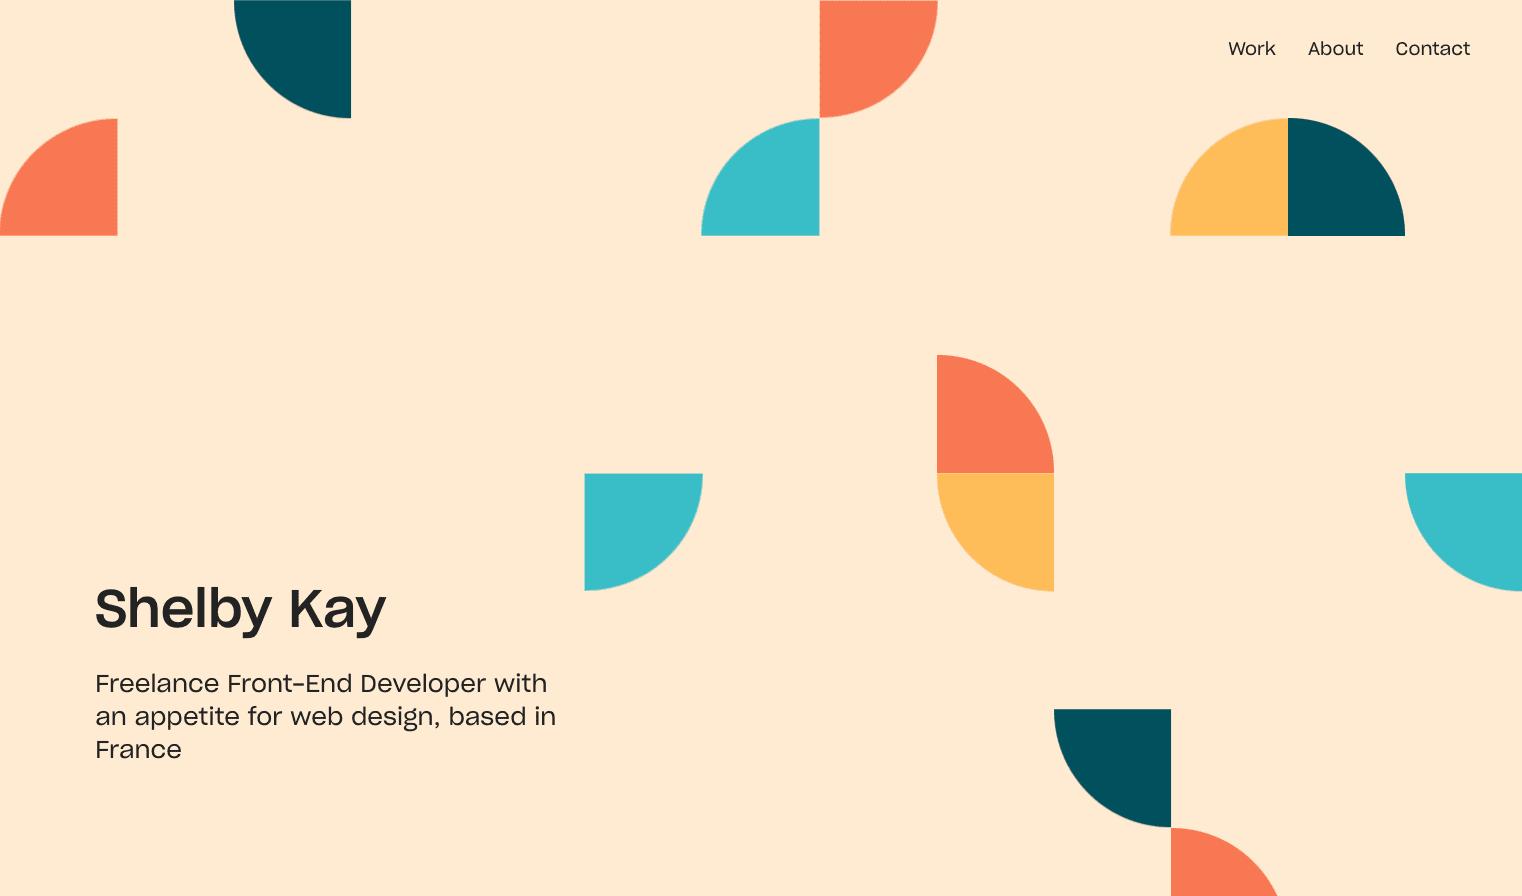 Shelby Kay's portfolio website